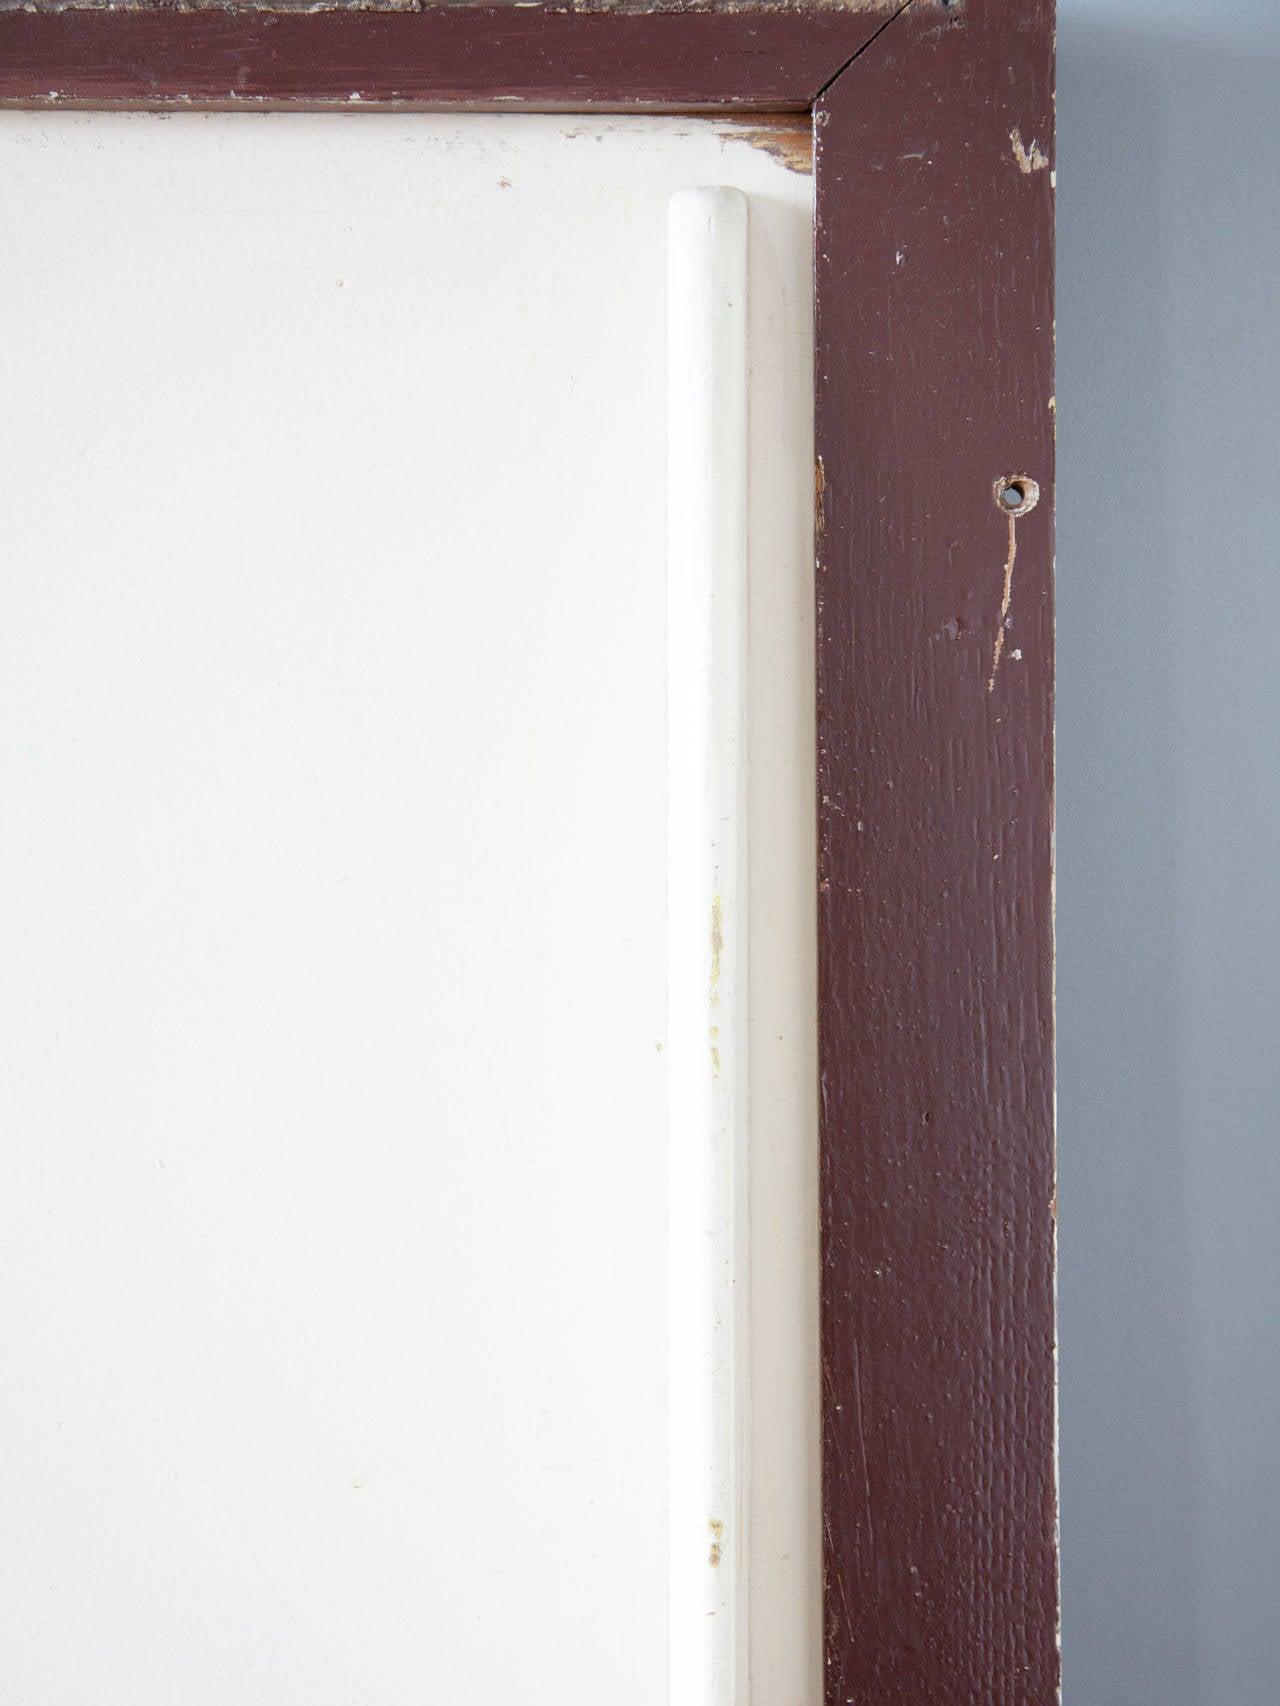 Jean Prouvé Sliding Cabinet Doors in Frames 5